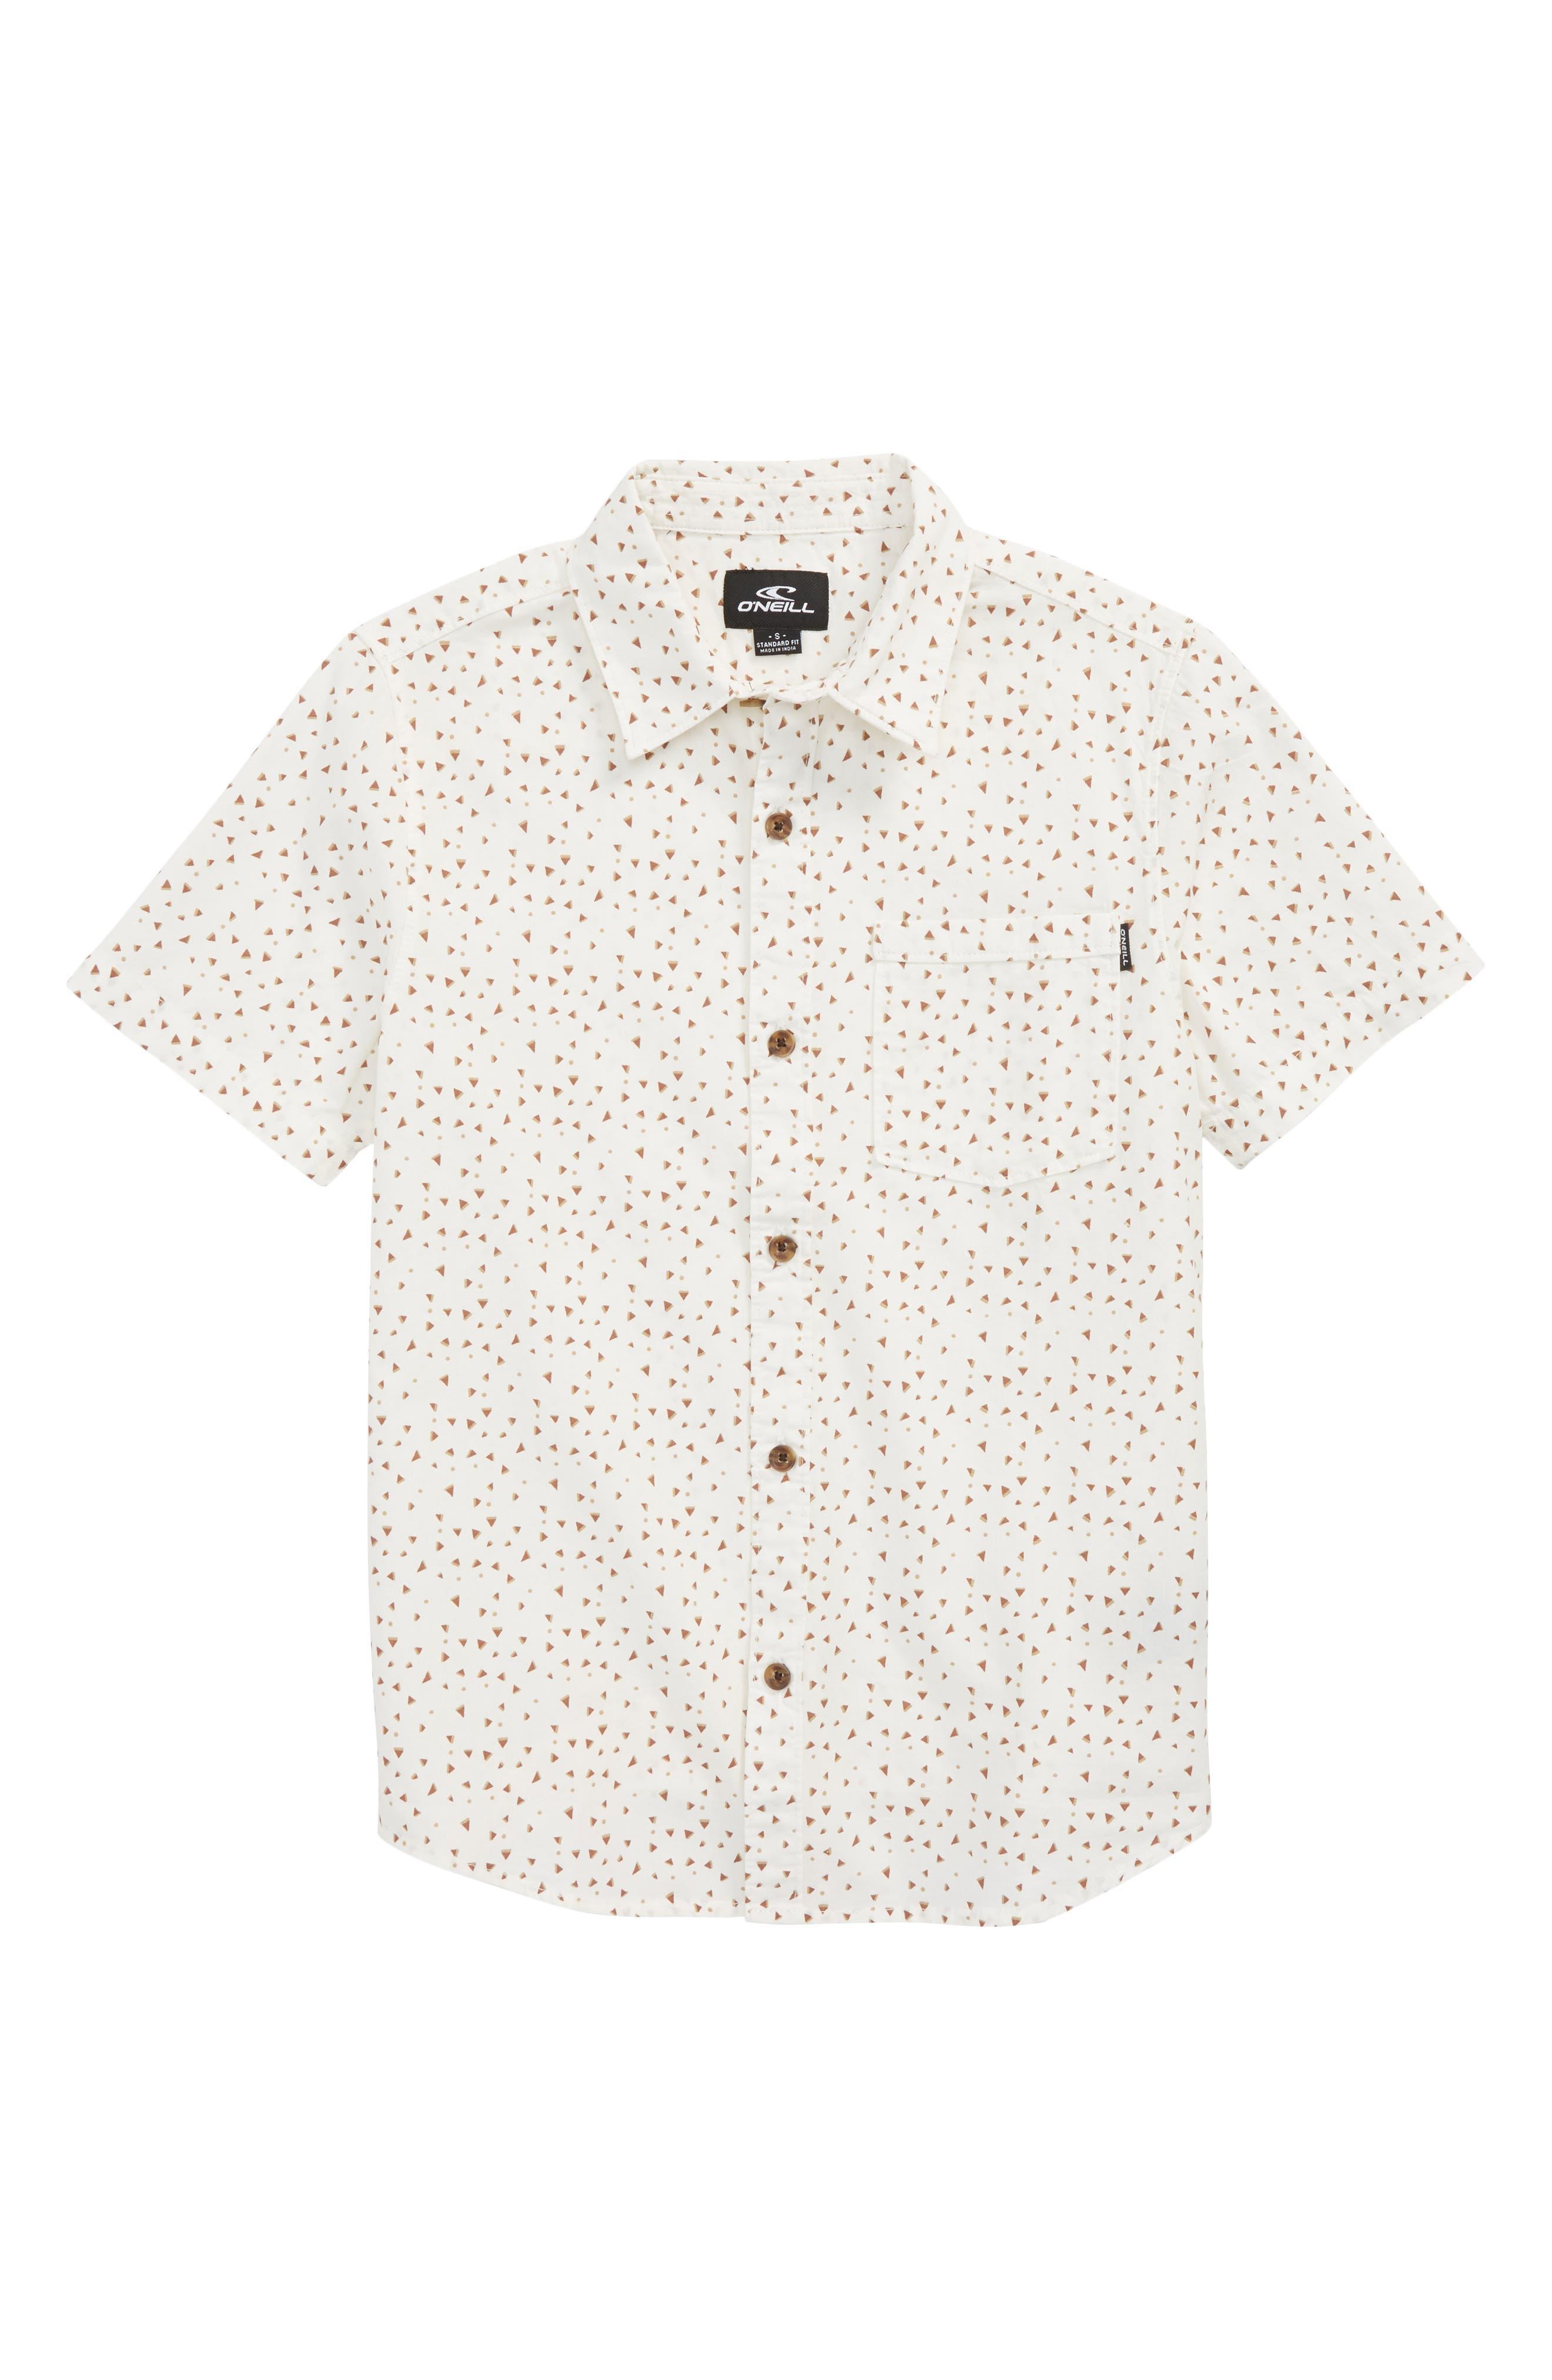 O'Neill Rowdy Print Woven Shirt (Big Boys)